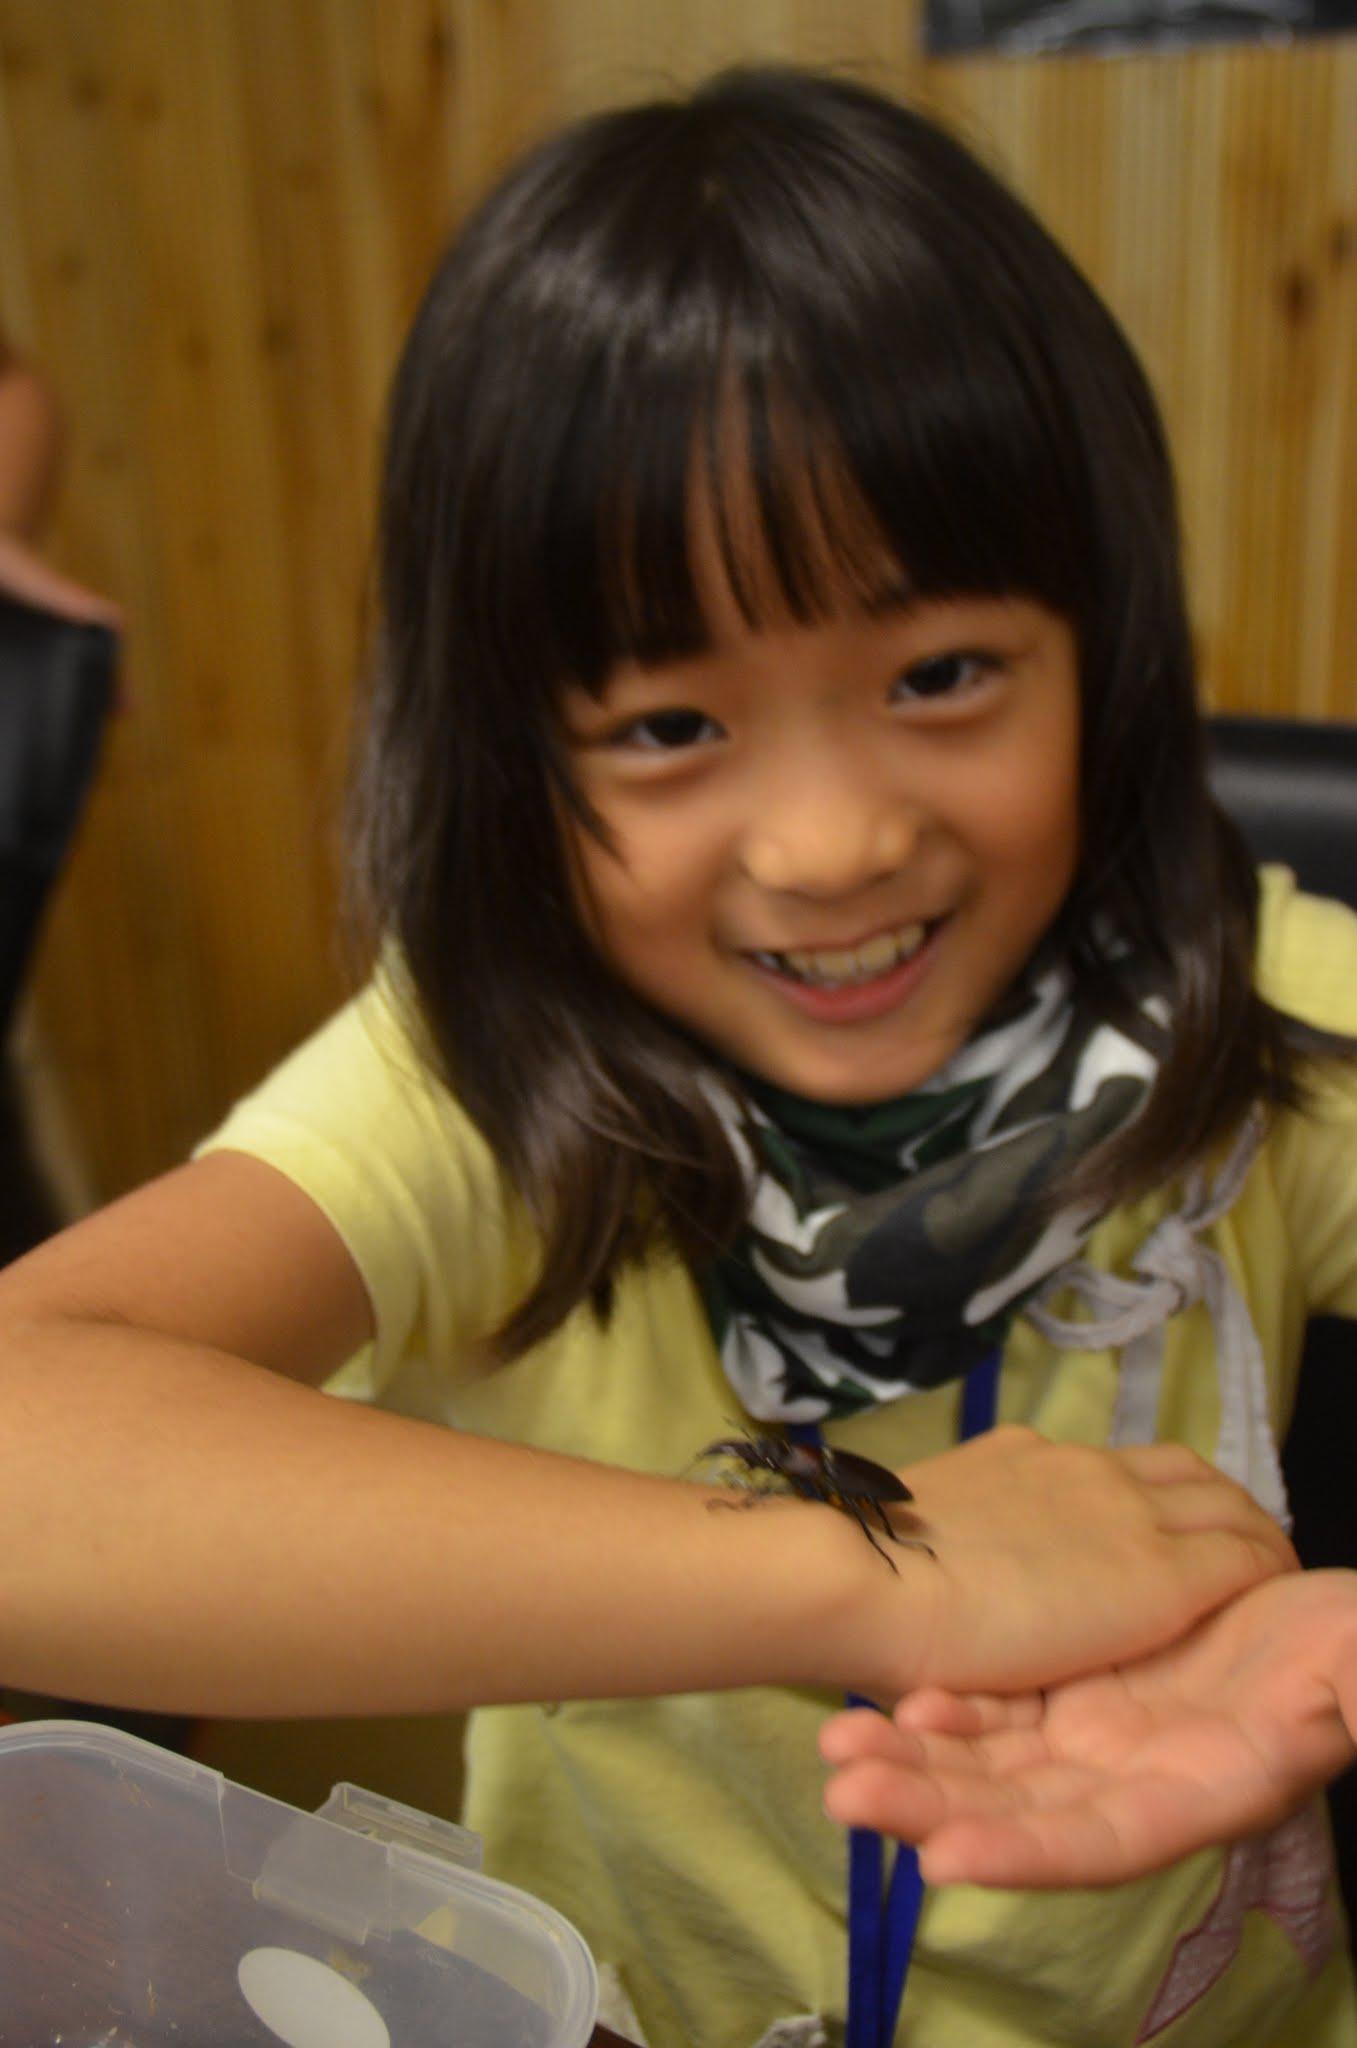 【JS】女子小学生 低学年画像スレPart1【JS】 [無断転載禁止]©bbspink.comYouTube動画>7本 ->画像>729枚